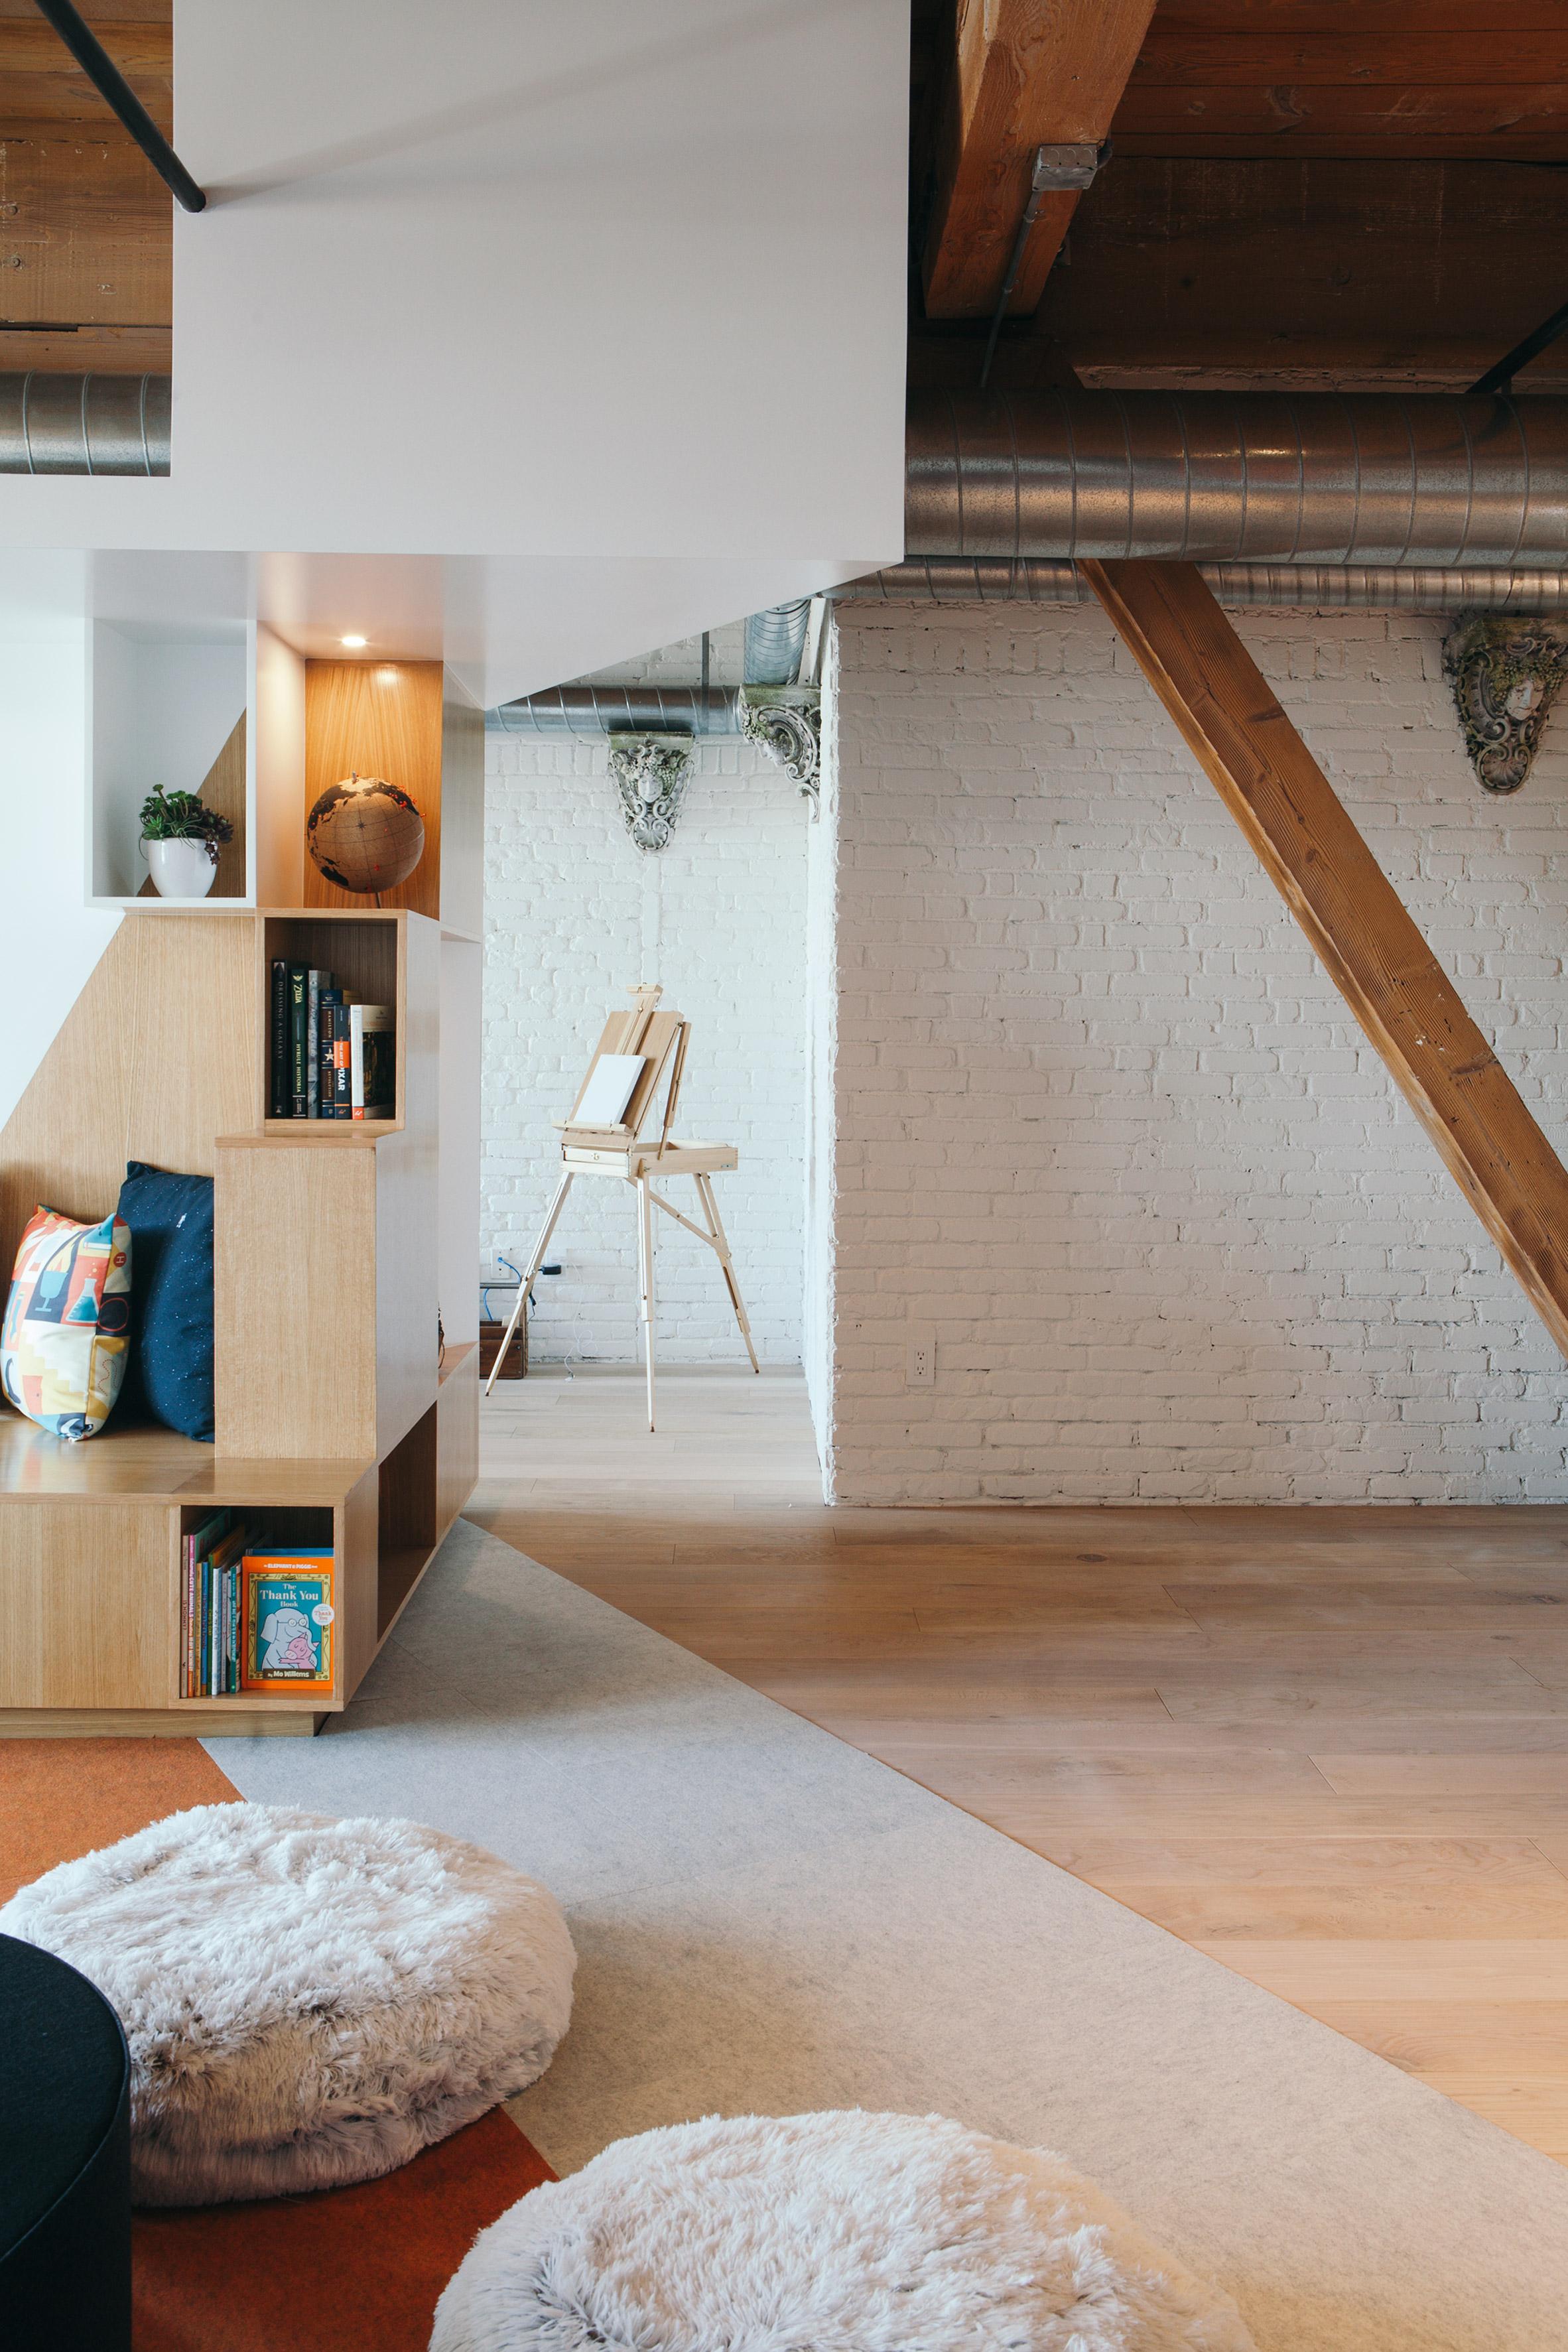 architecture-loft-interior-design-studia-osnovadesign-osnova-poltava_05